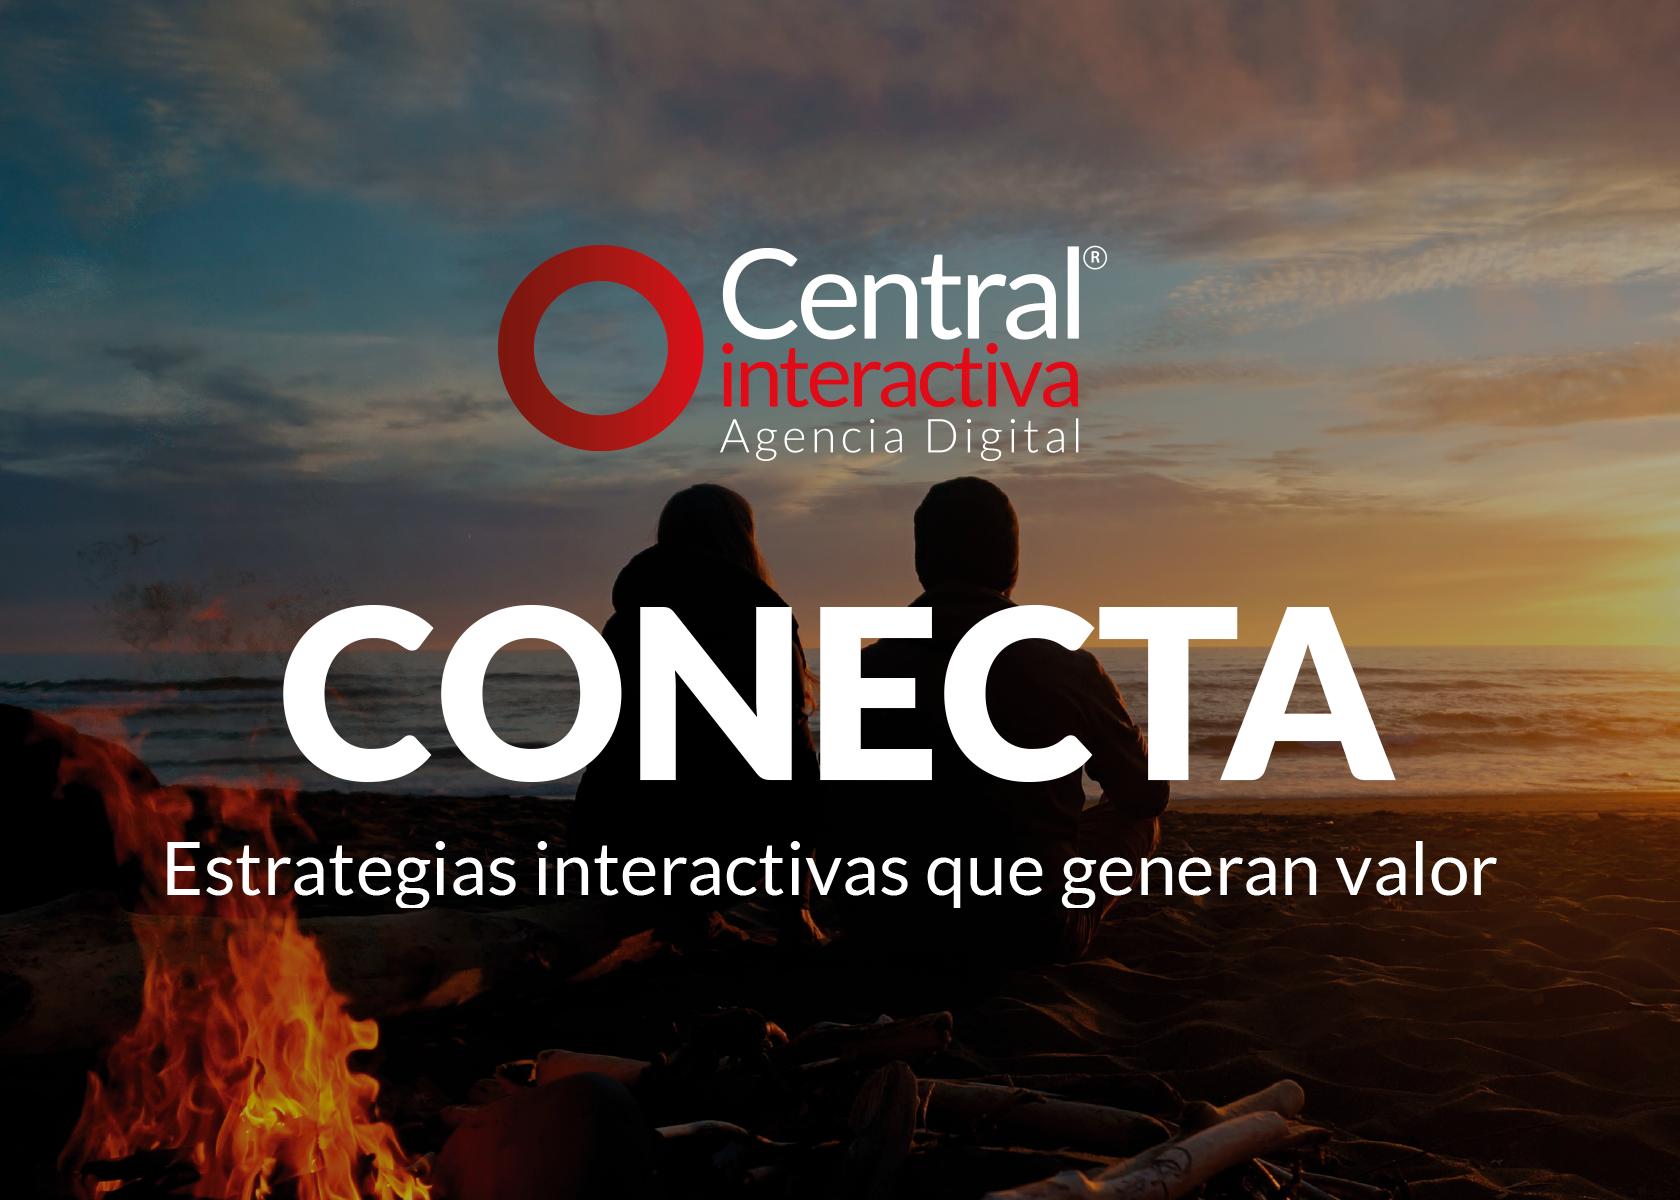 Central Interactiva